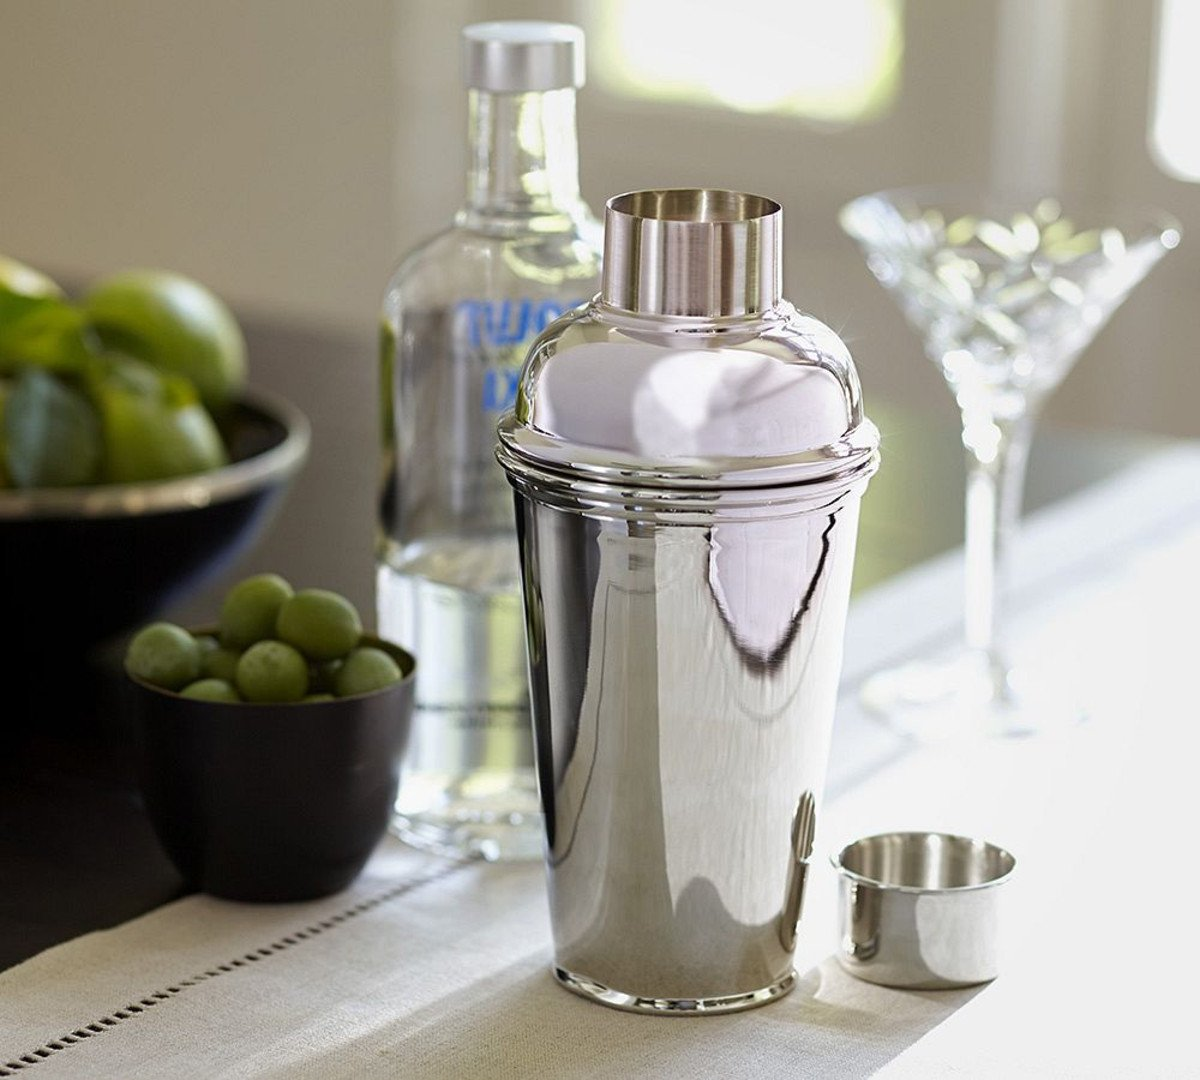 Cocteleras o shakers